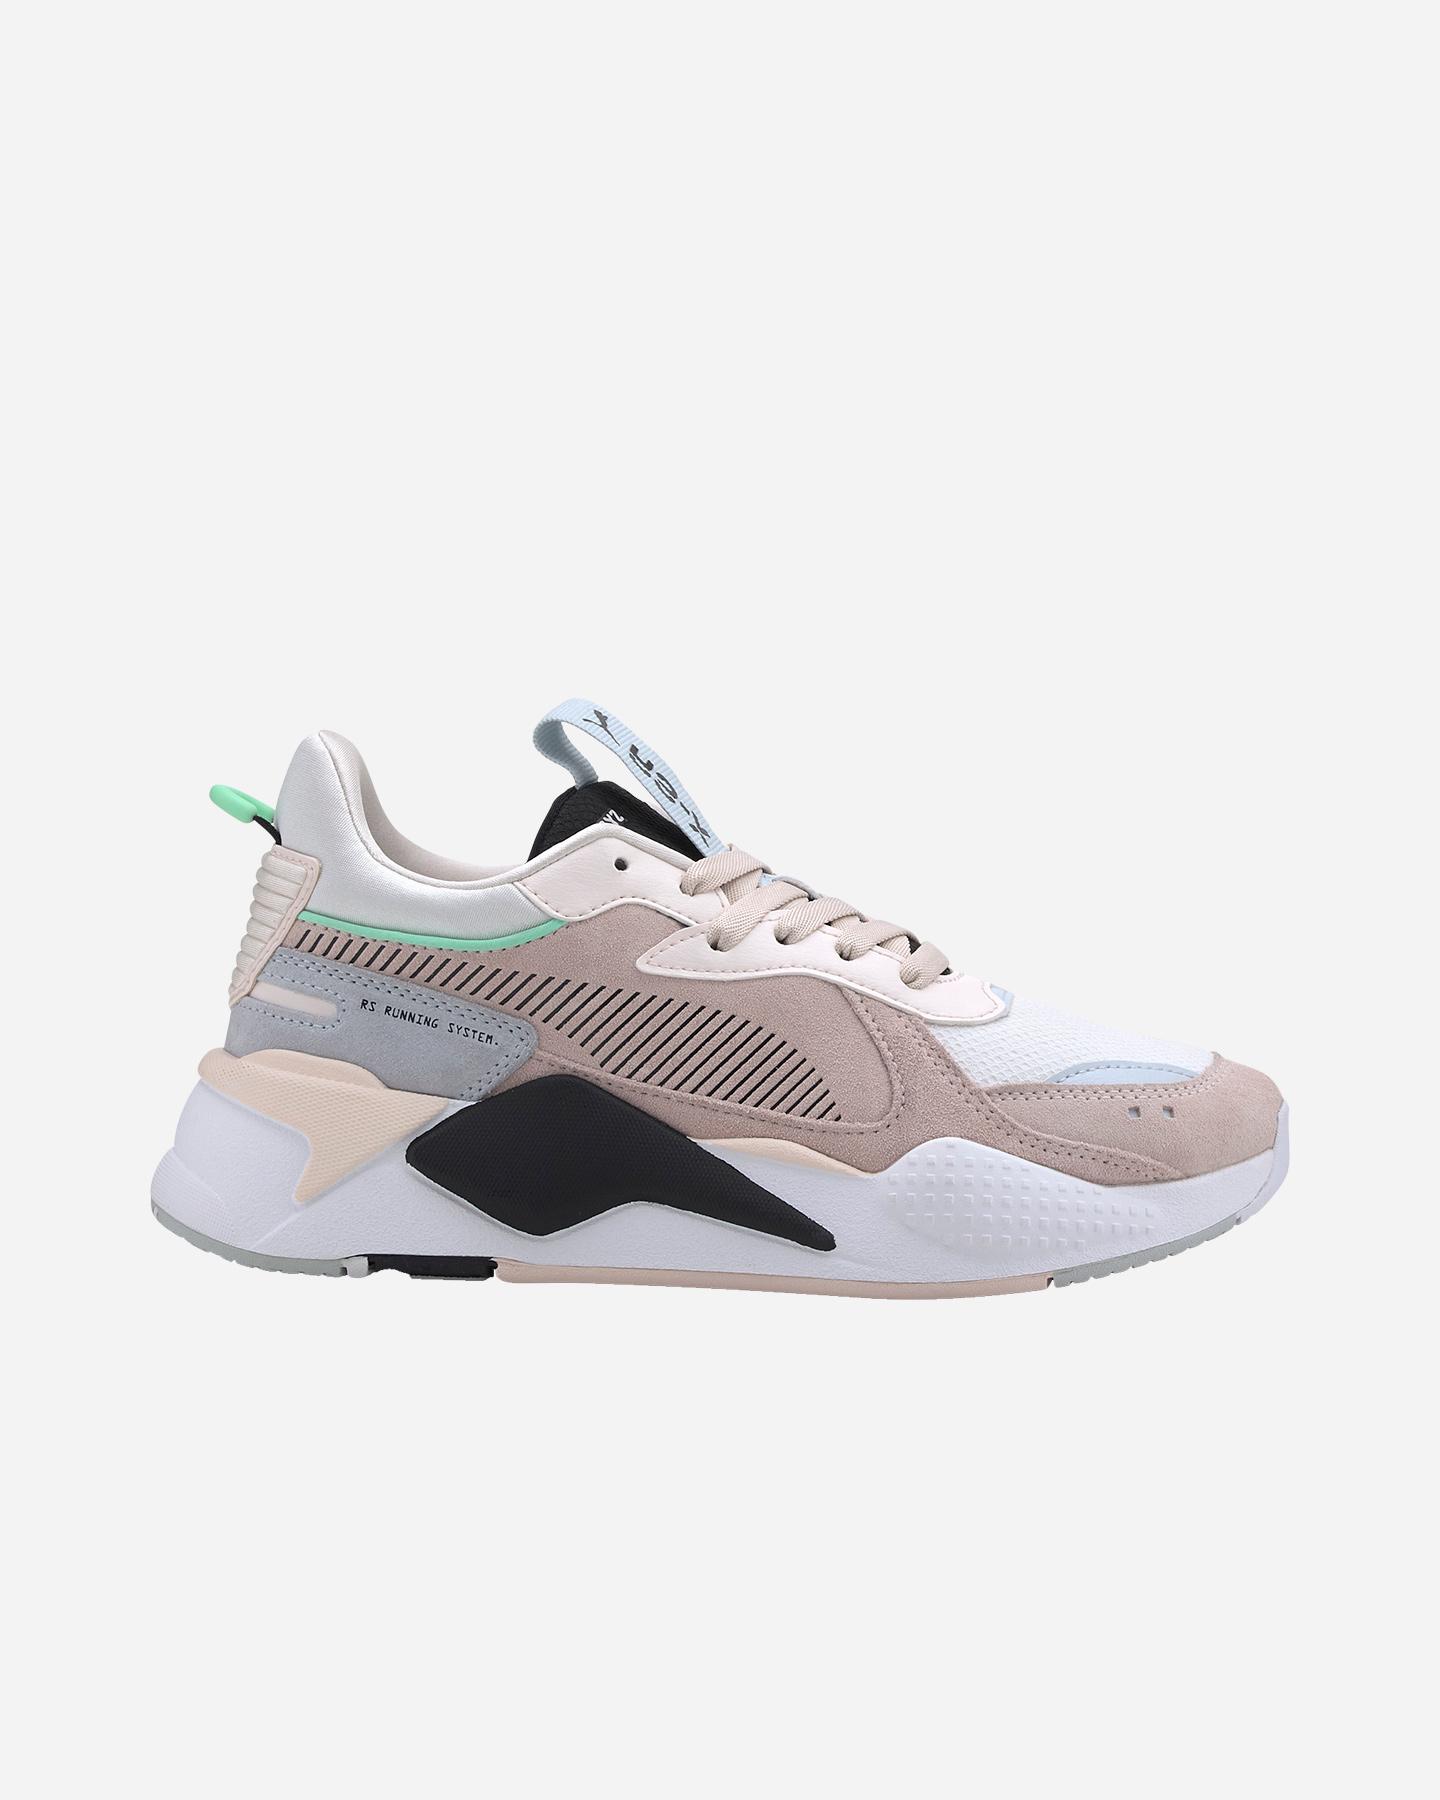 Scarpe Sneakers Puma Rs x Reinvent W 37100804 | Cisalfa Sport